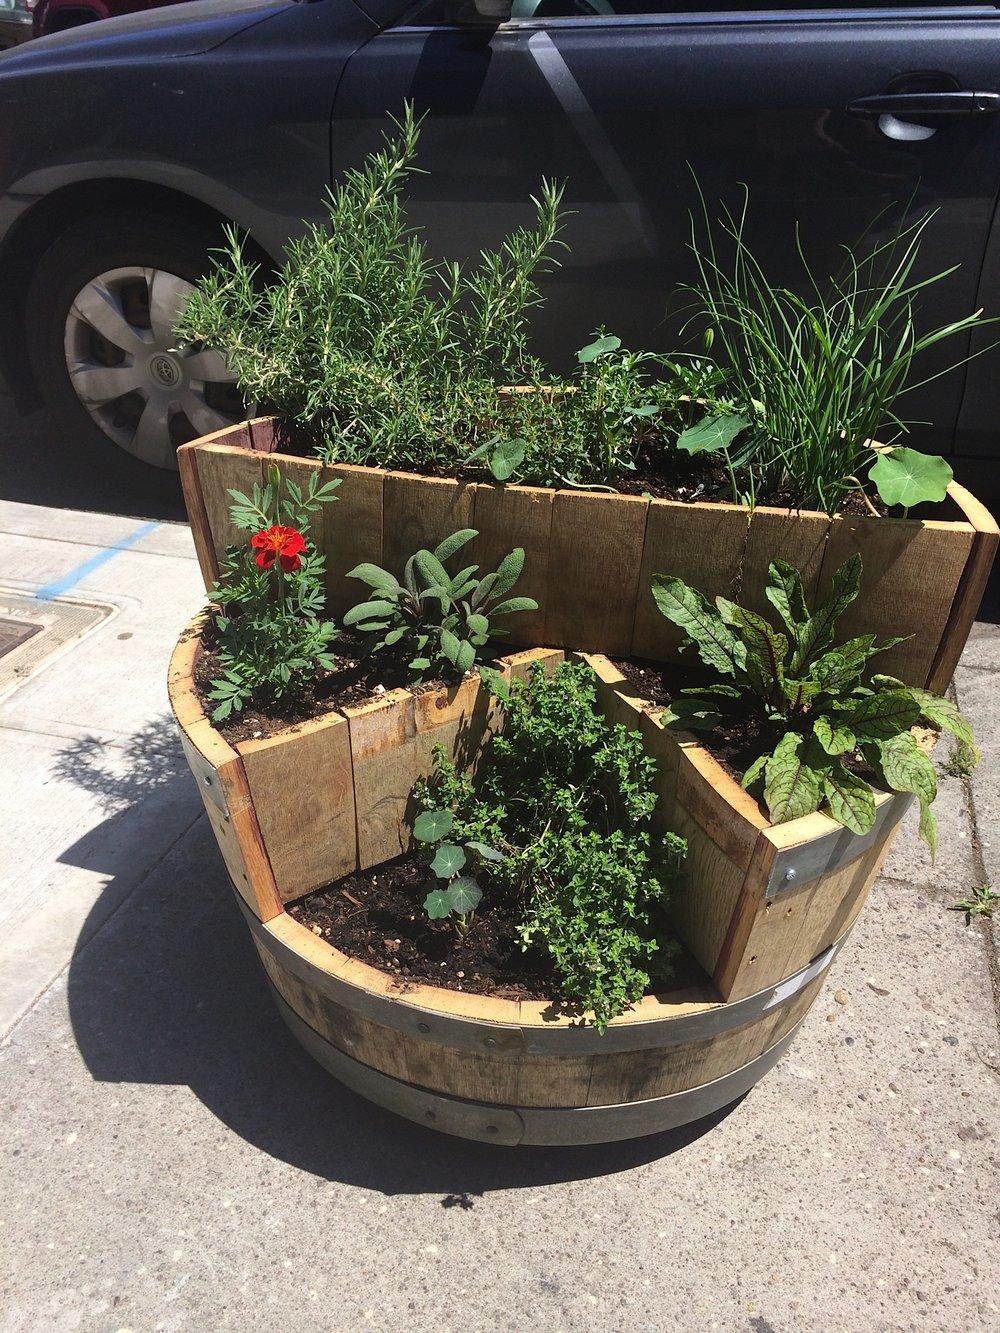 Multi-tiered barrel planter